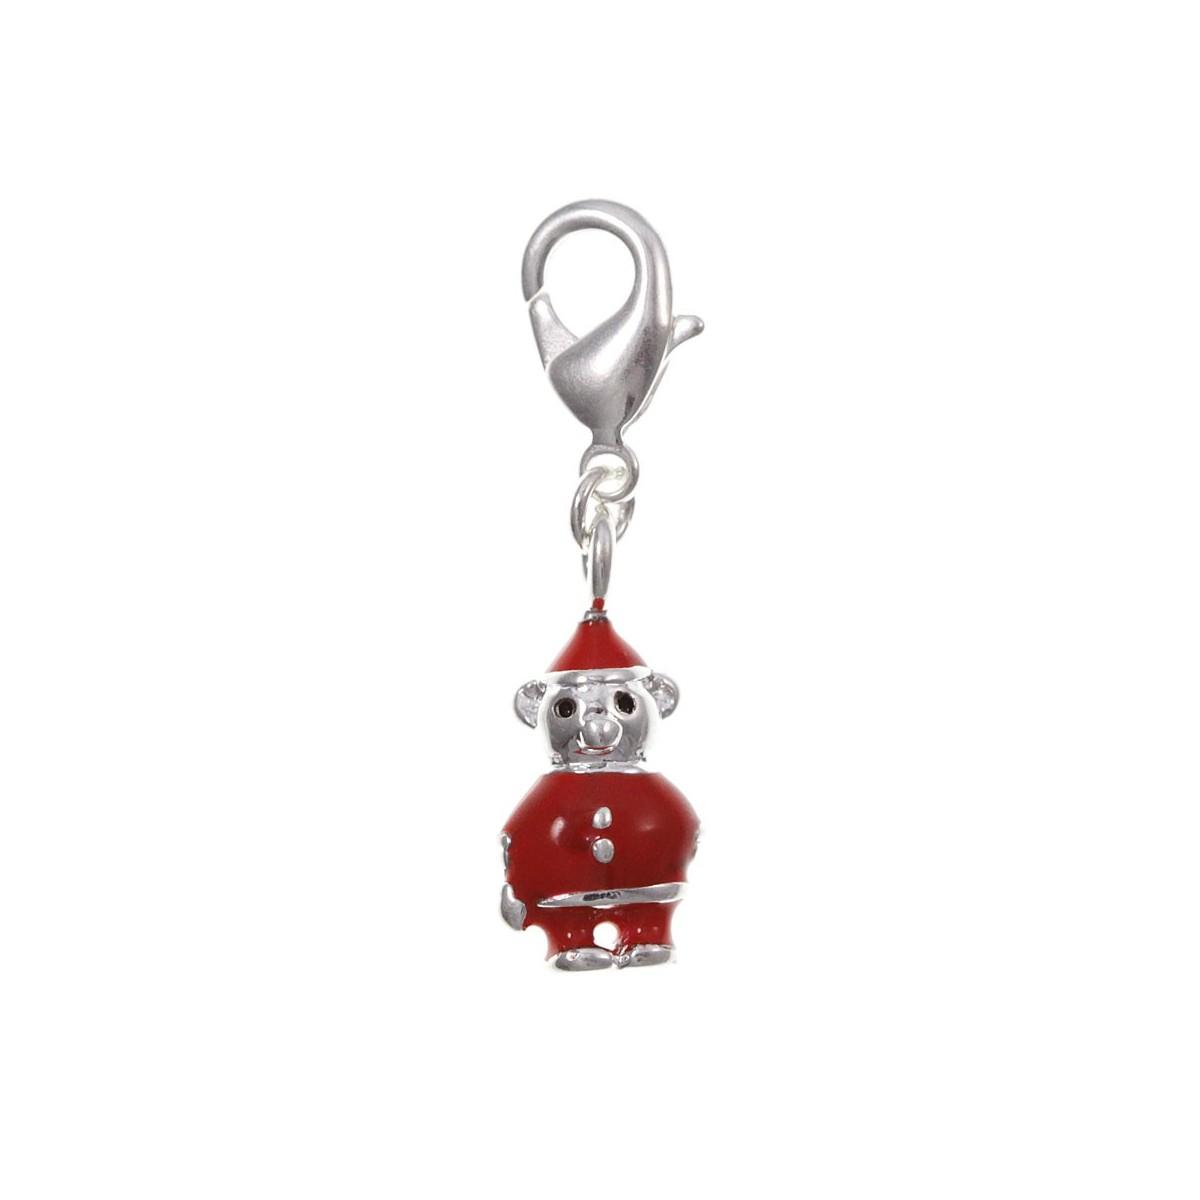 Charm lutin rouge So Charm plaqué argent 3 microns